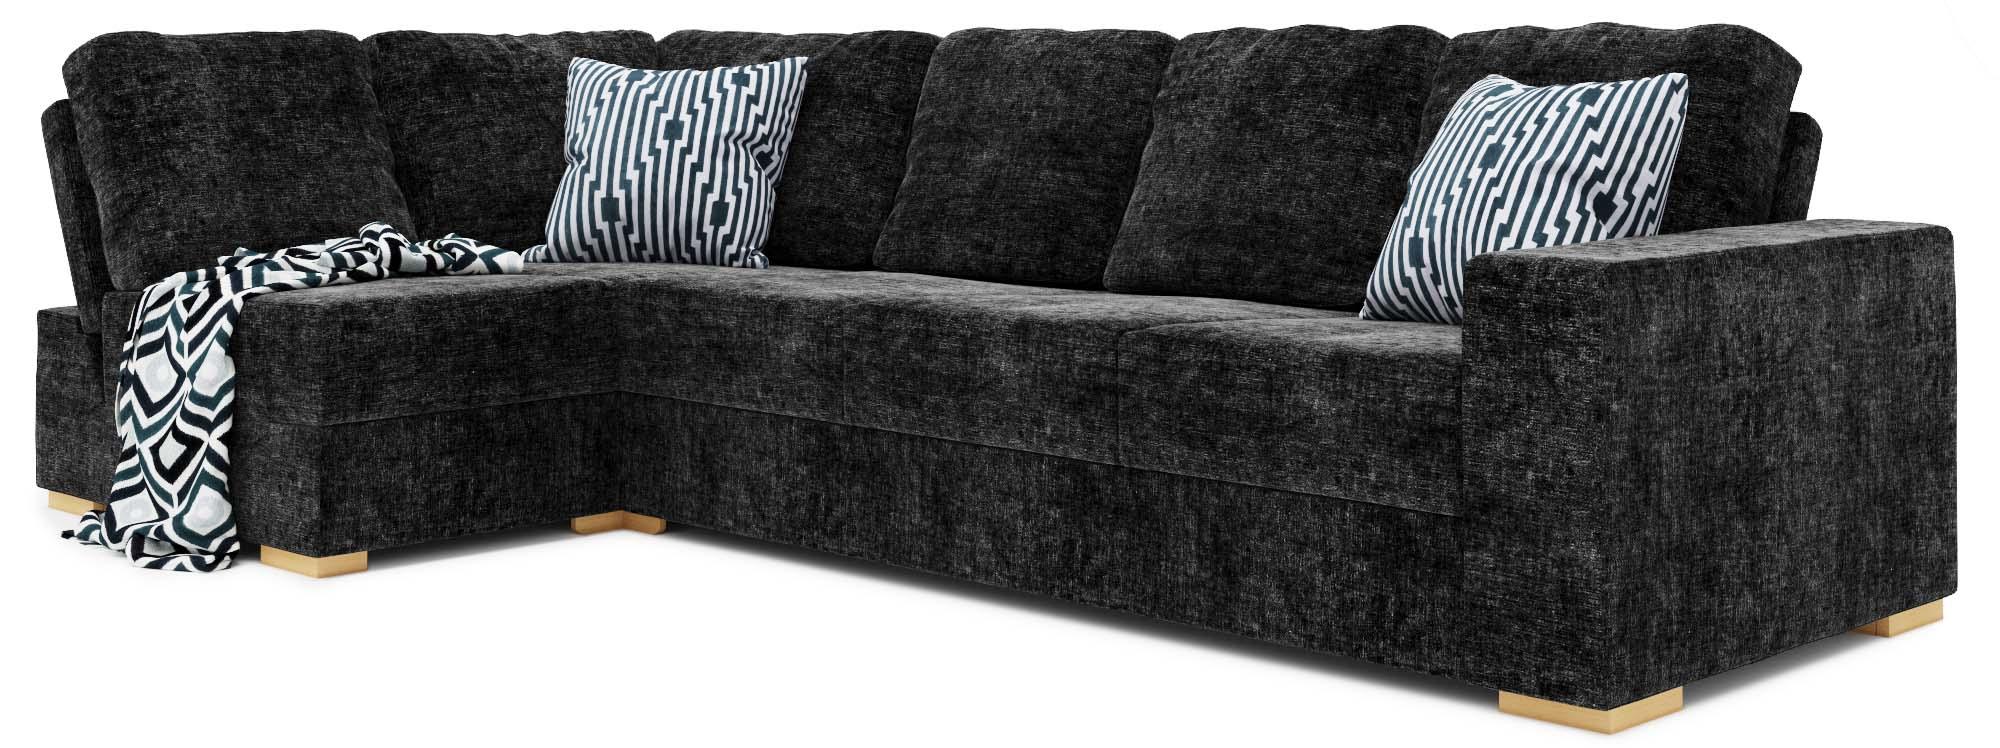 Lear 4X2 Corner Double Sofa Bed